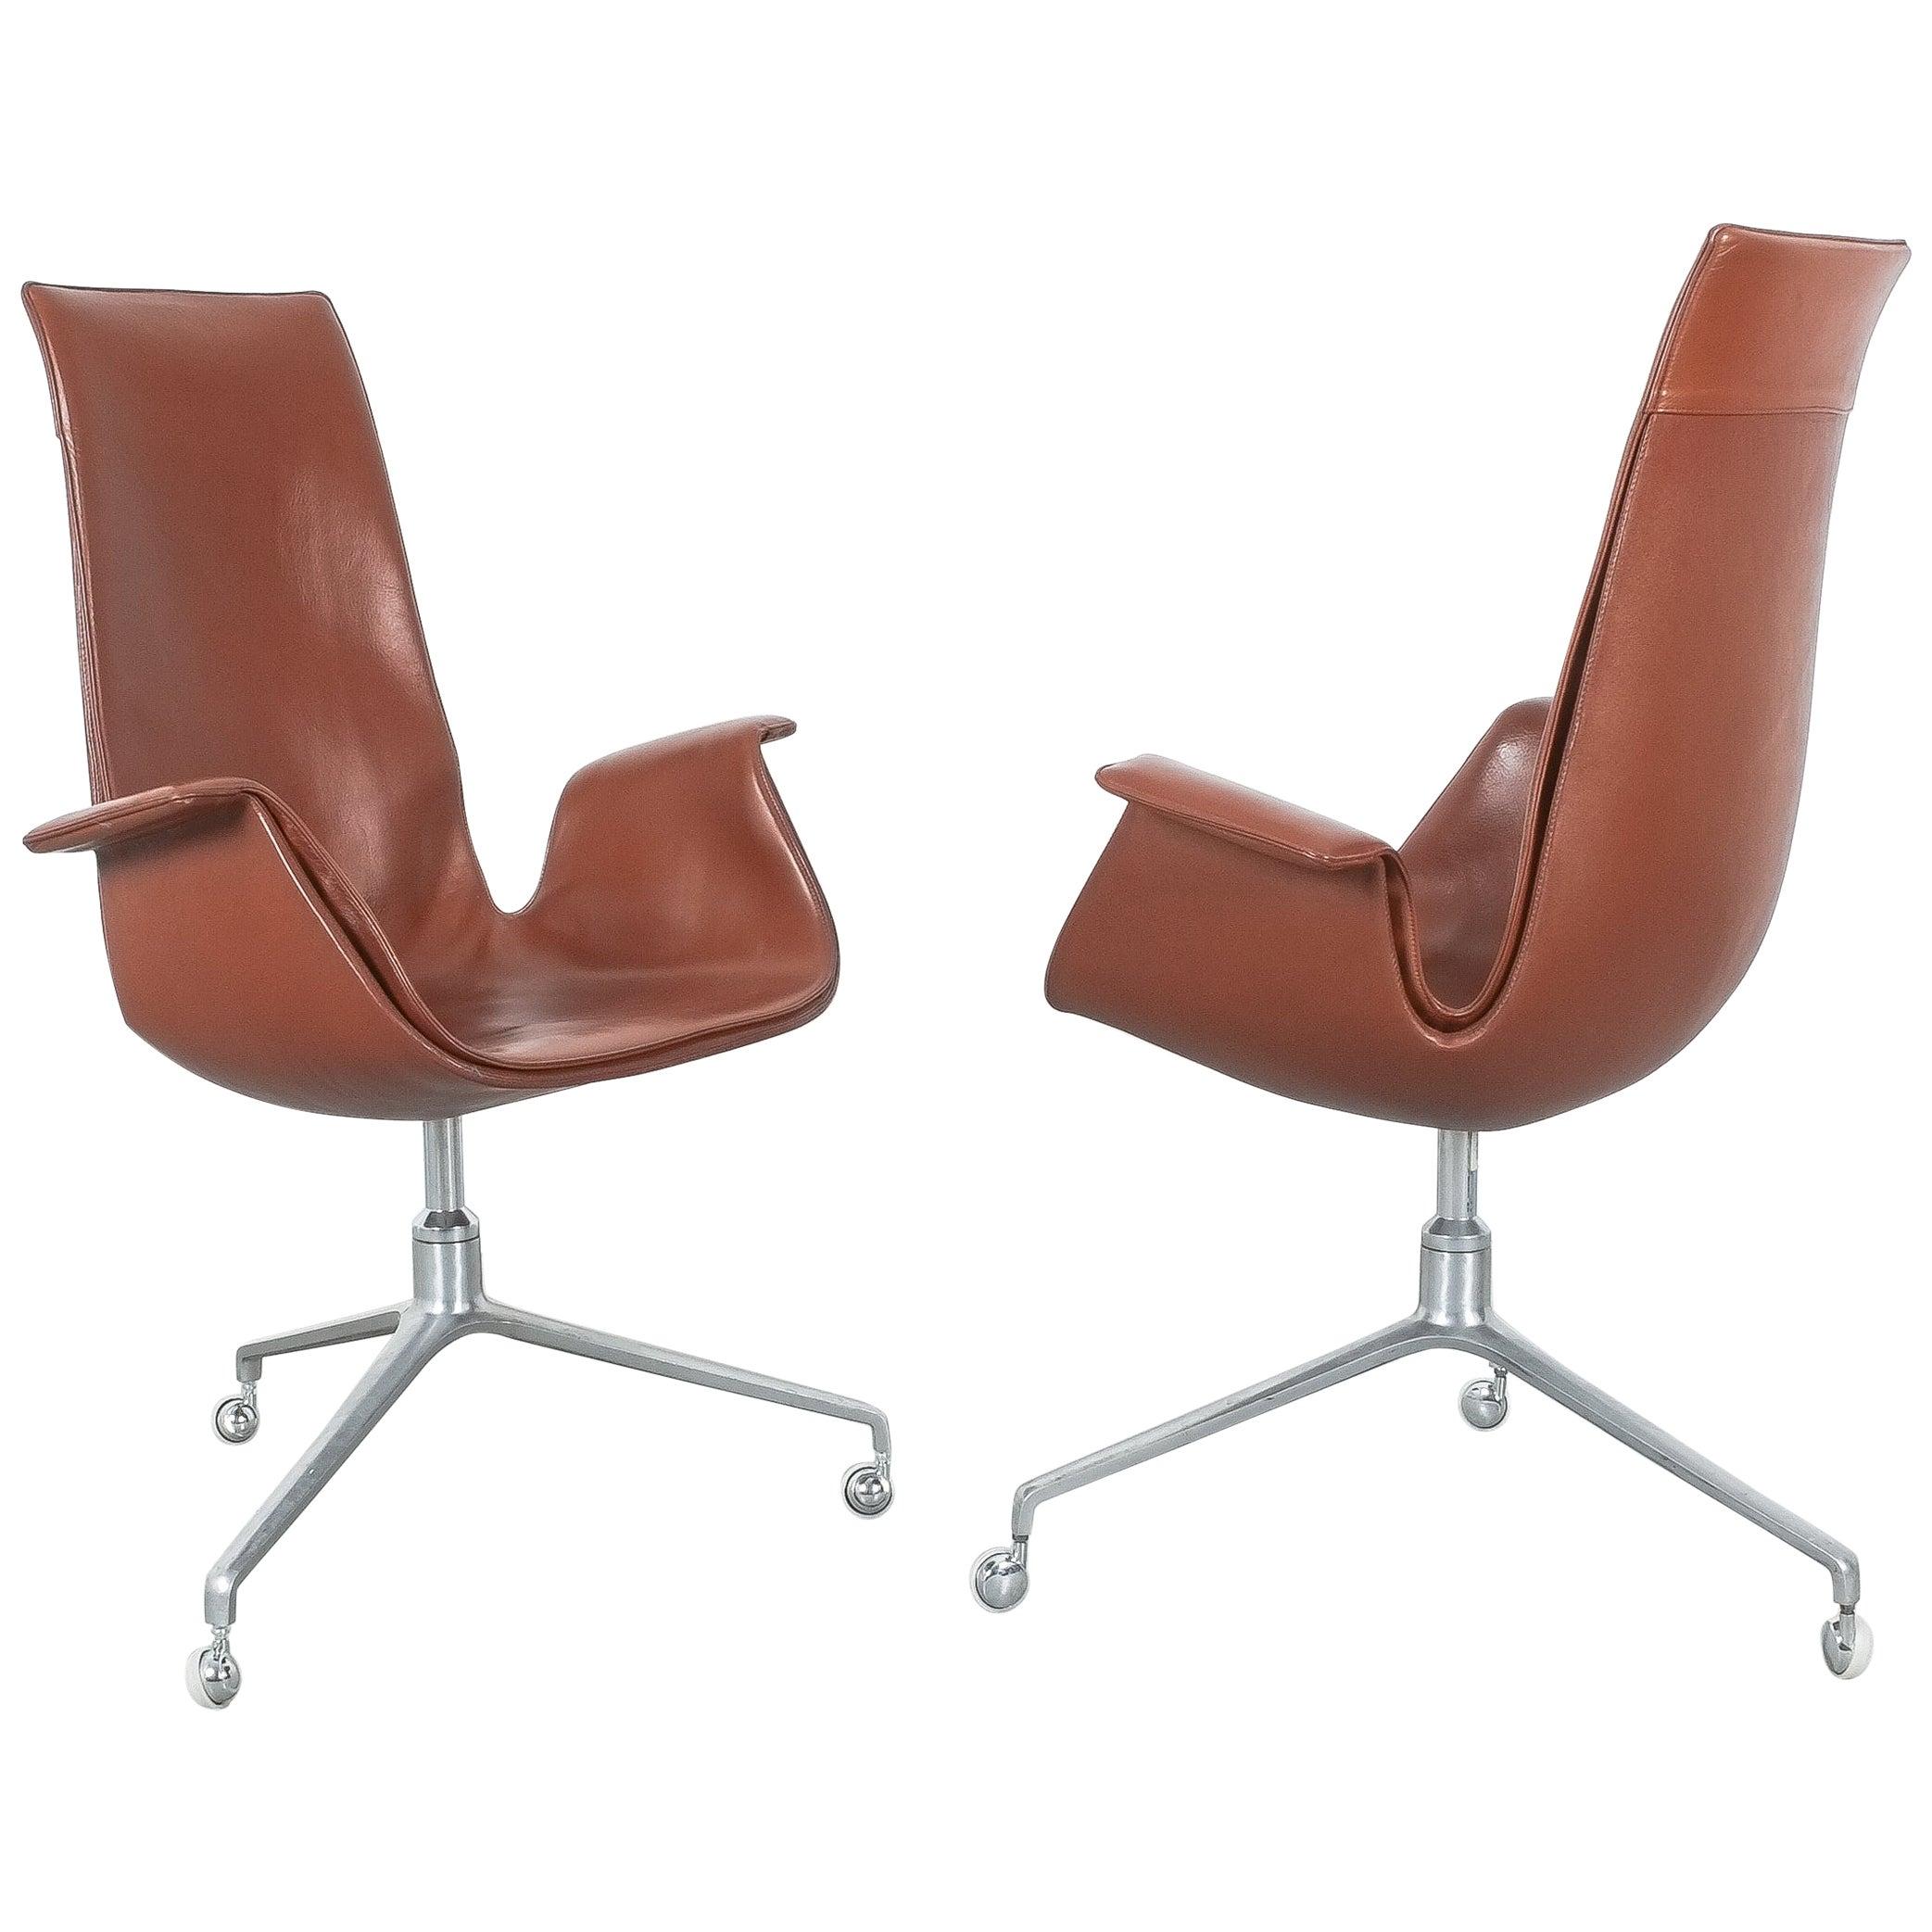 Swivel Tulip Chair by Preben Fabricius & Jørgen Kastholm for Kill International